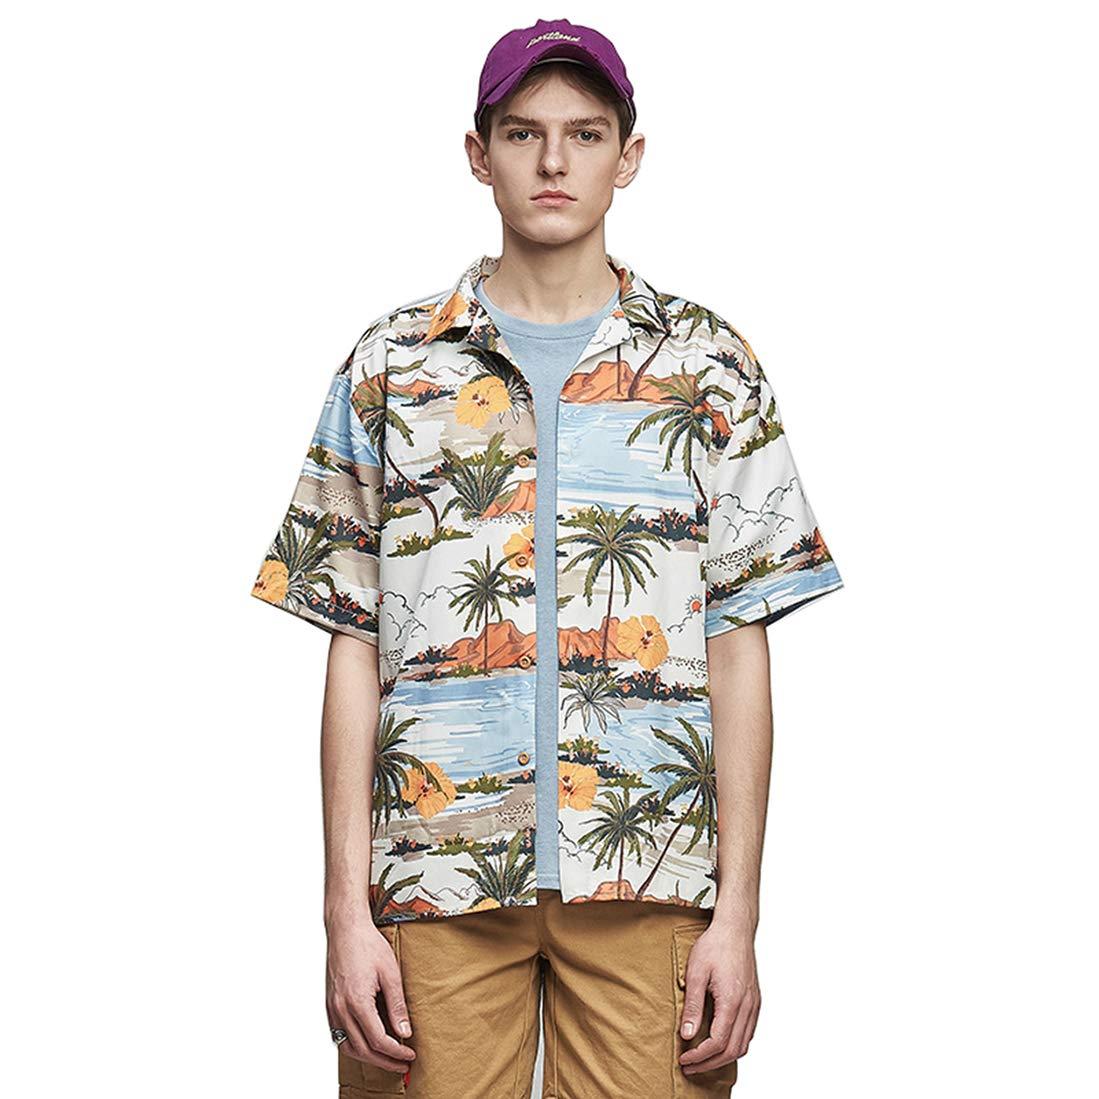 Mens Coconut Print Short Sleeve Beach Hawaii-Shirts Button Down Aloha Shirt Oversized Holiday